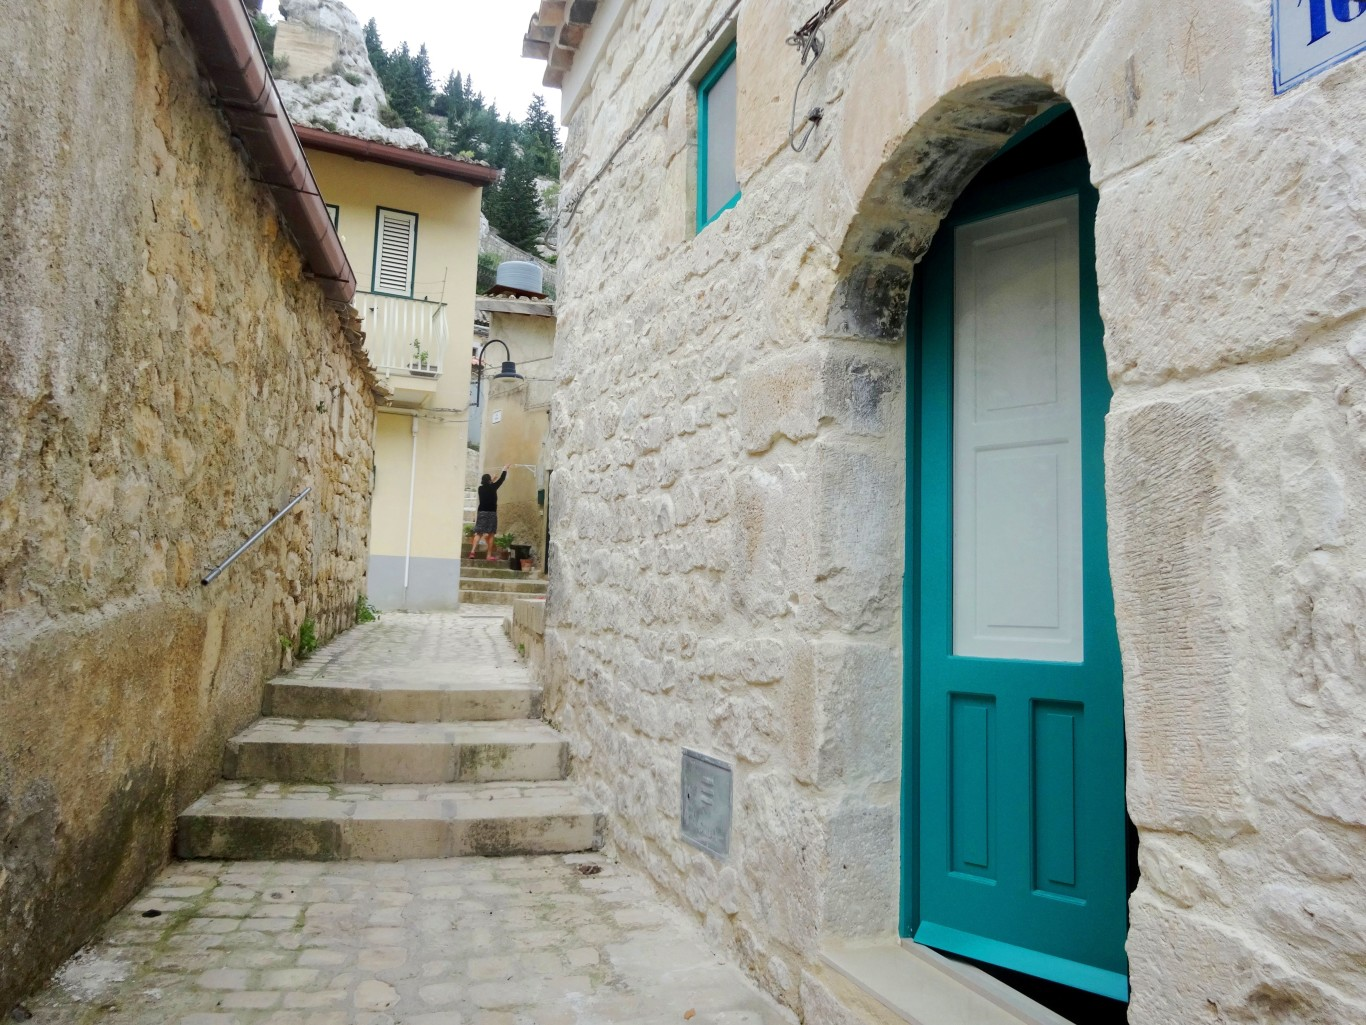 Casa Via Tivoli - C'era una volta #Scicli